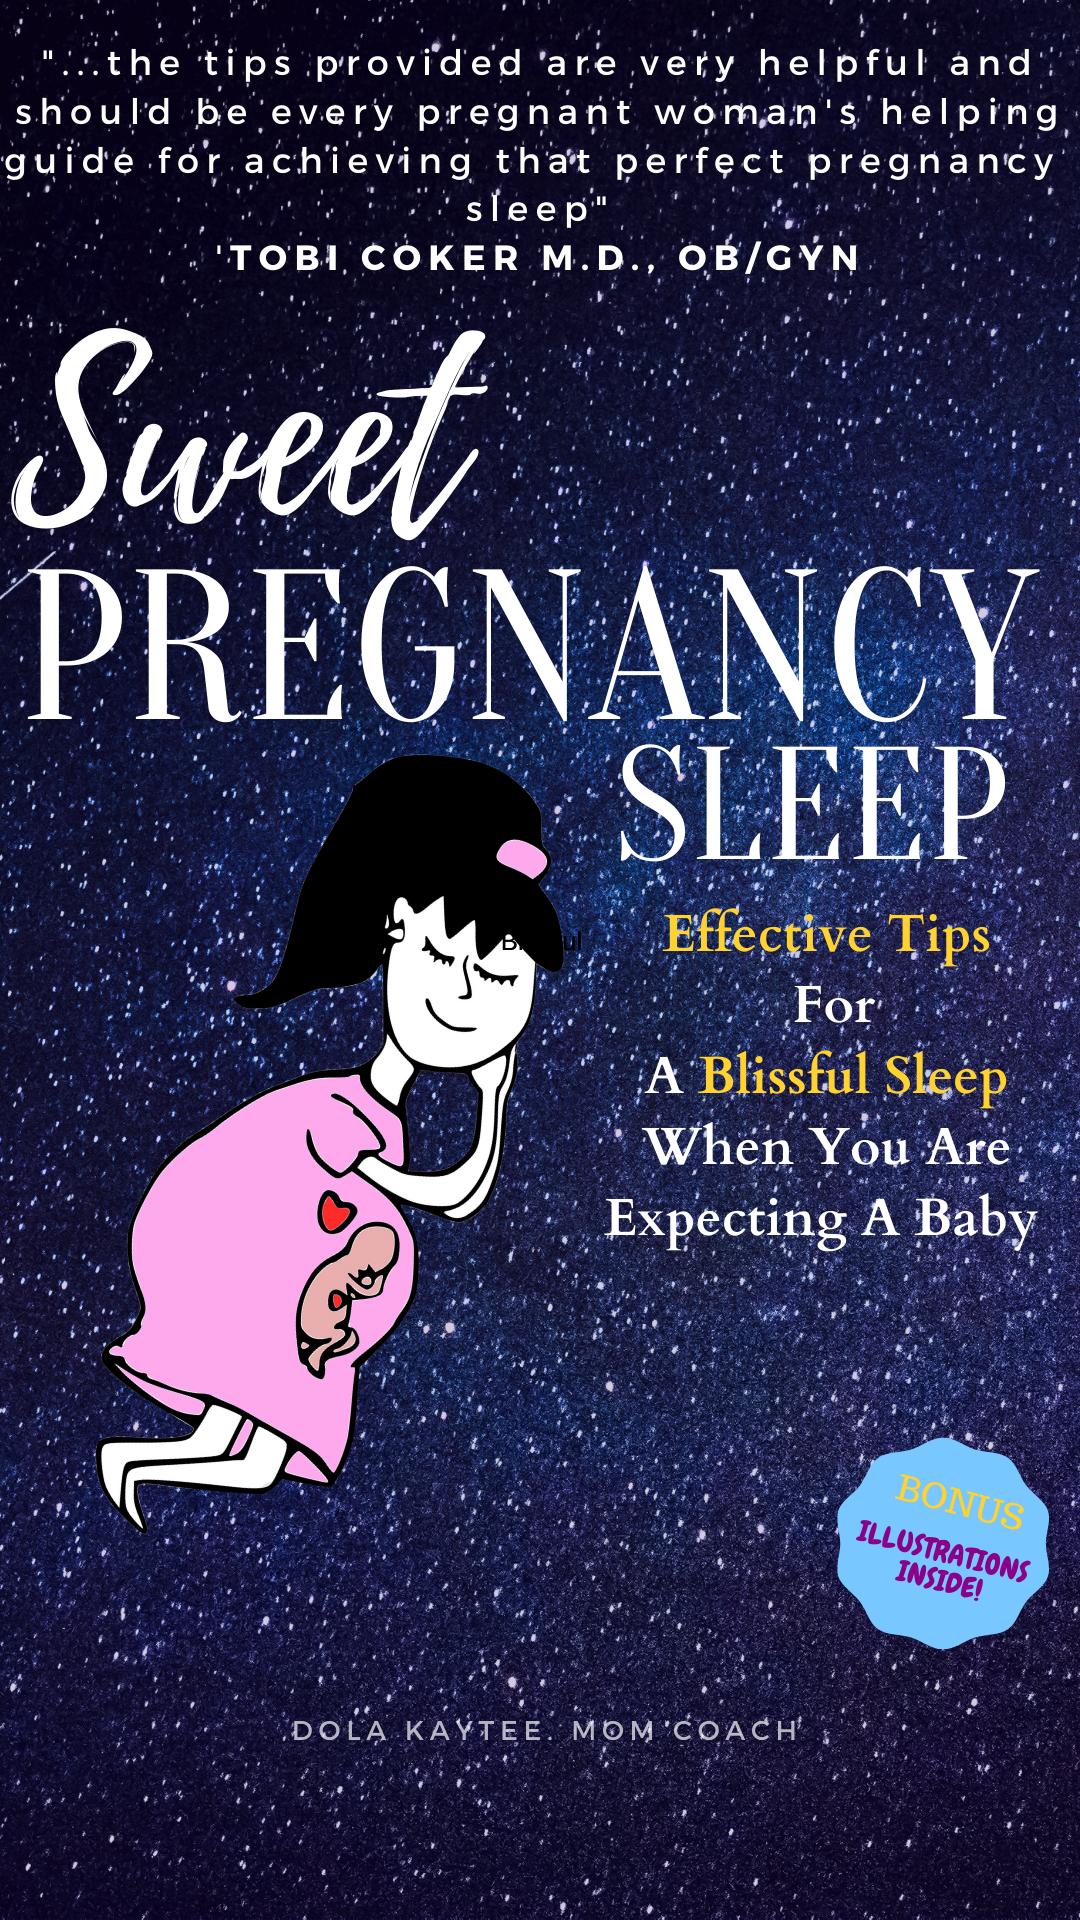 Sweet Pregnancy Sleep